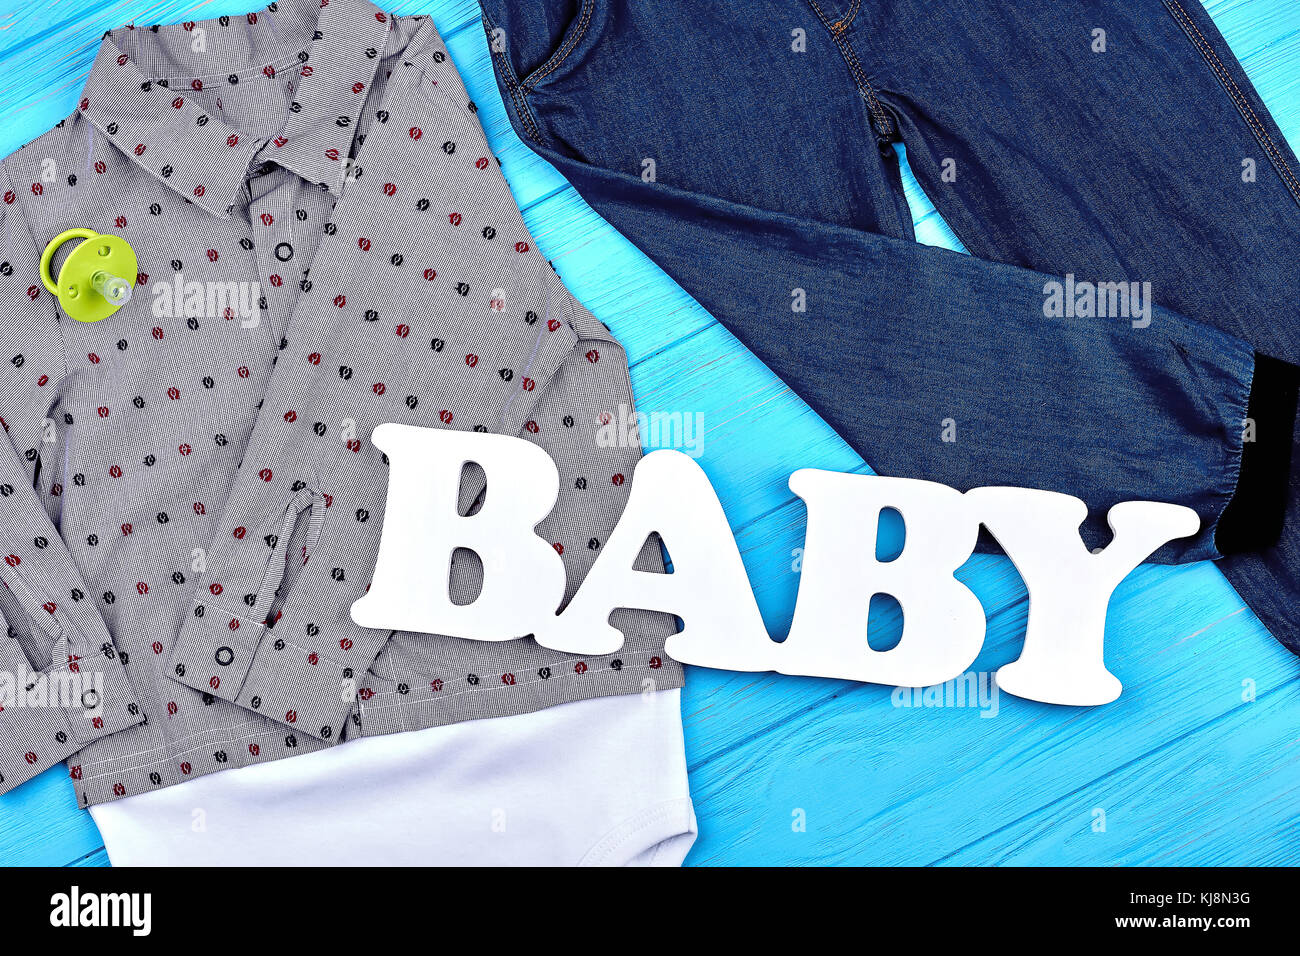 96ae3ab1a0dd0 Baby-boy clothes for autumn wear. Infant boy modern clothes Stock ...